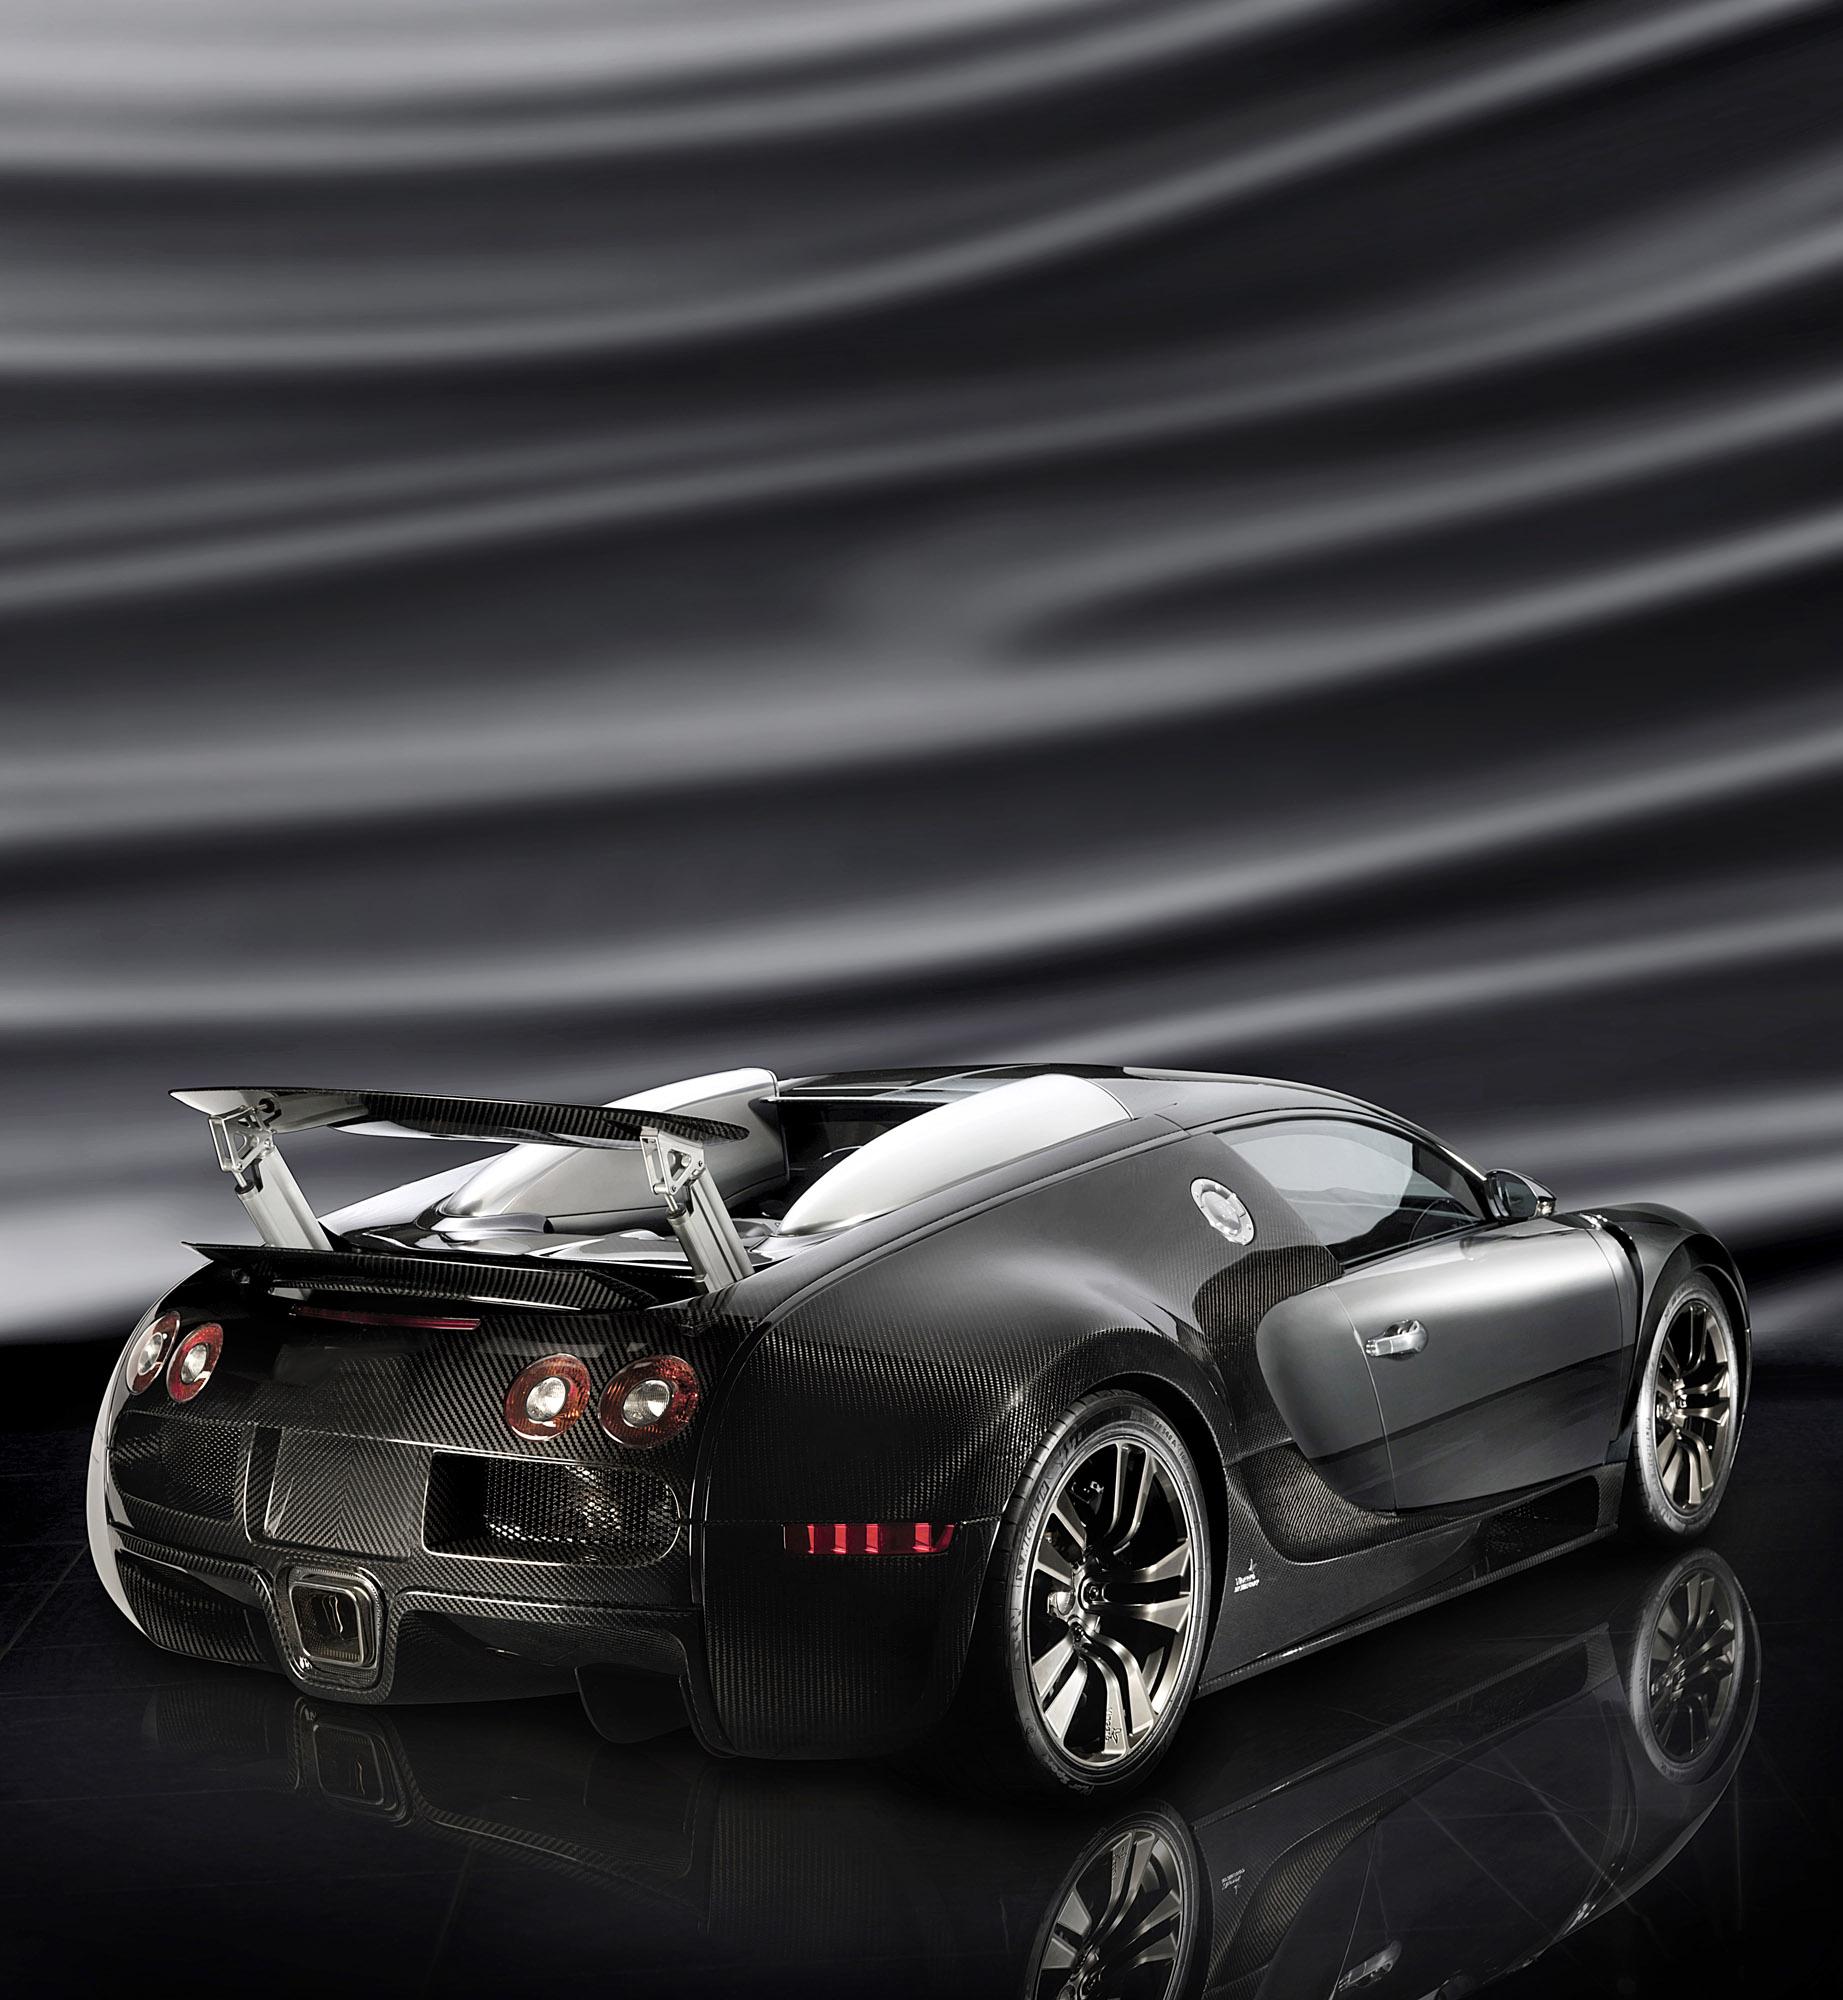 vincero-bugatti-veyron-164-04 Wonderful Bugatti Veyron Grand Sport Vitesse Mansory Vivere 2014 Cars Trend